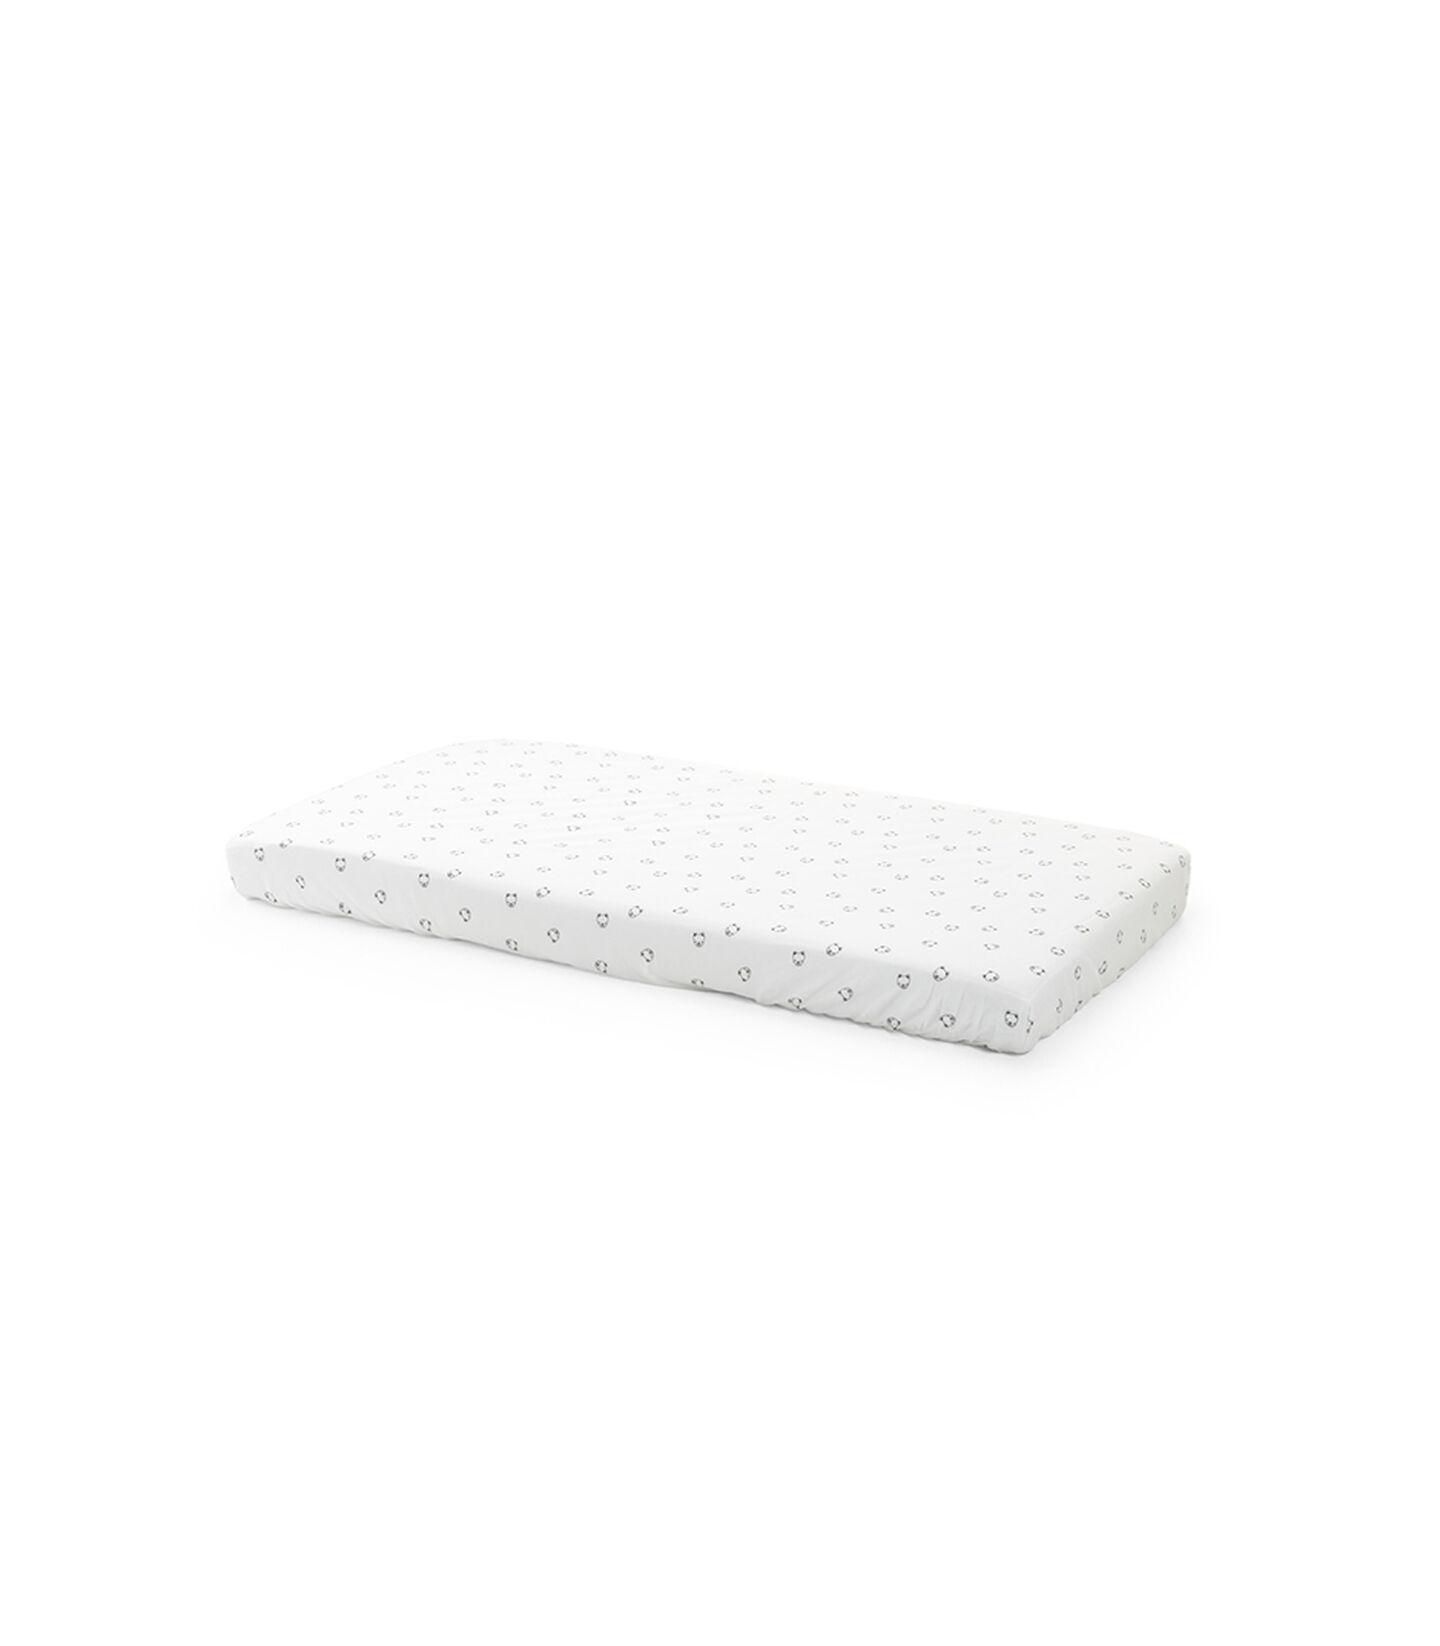 Stokke® Home™ Bed Fitted Sheet - prześcieradło, 2 szt. - Monochrome Bear, Monochrome Bear, mainview view 2